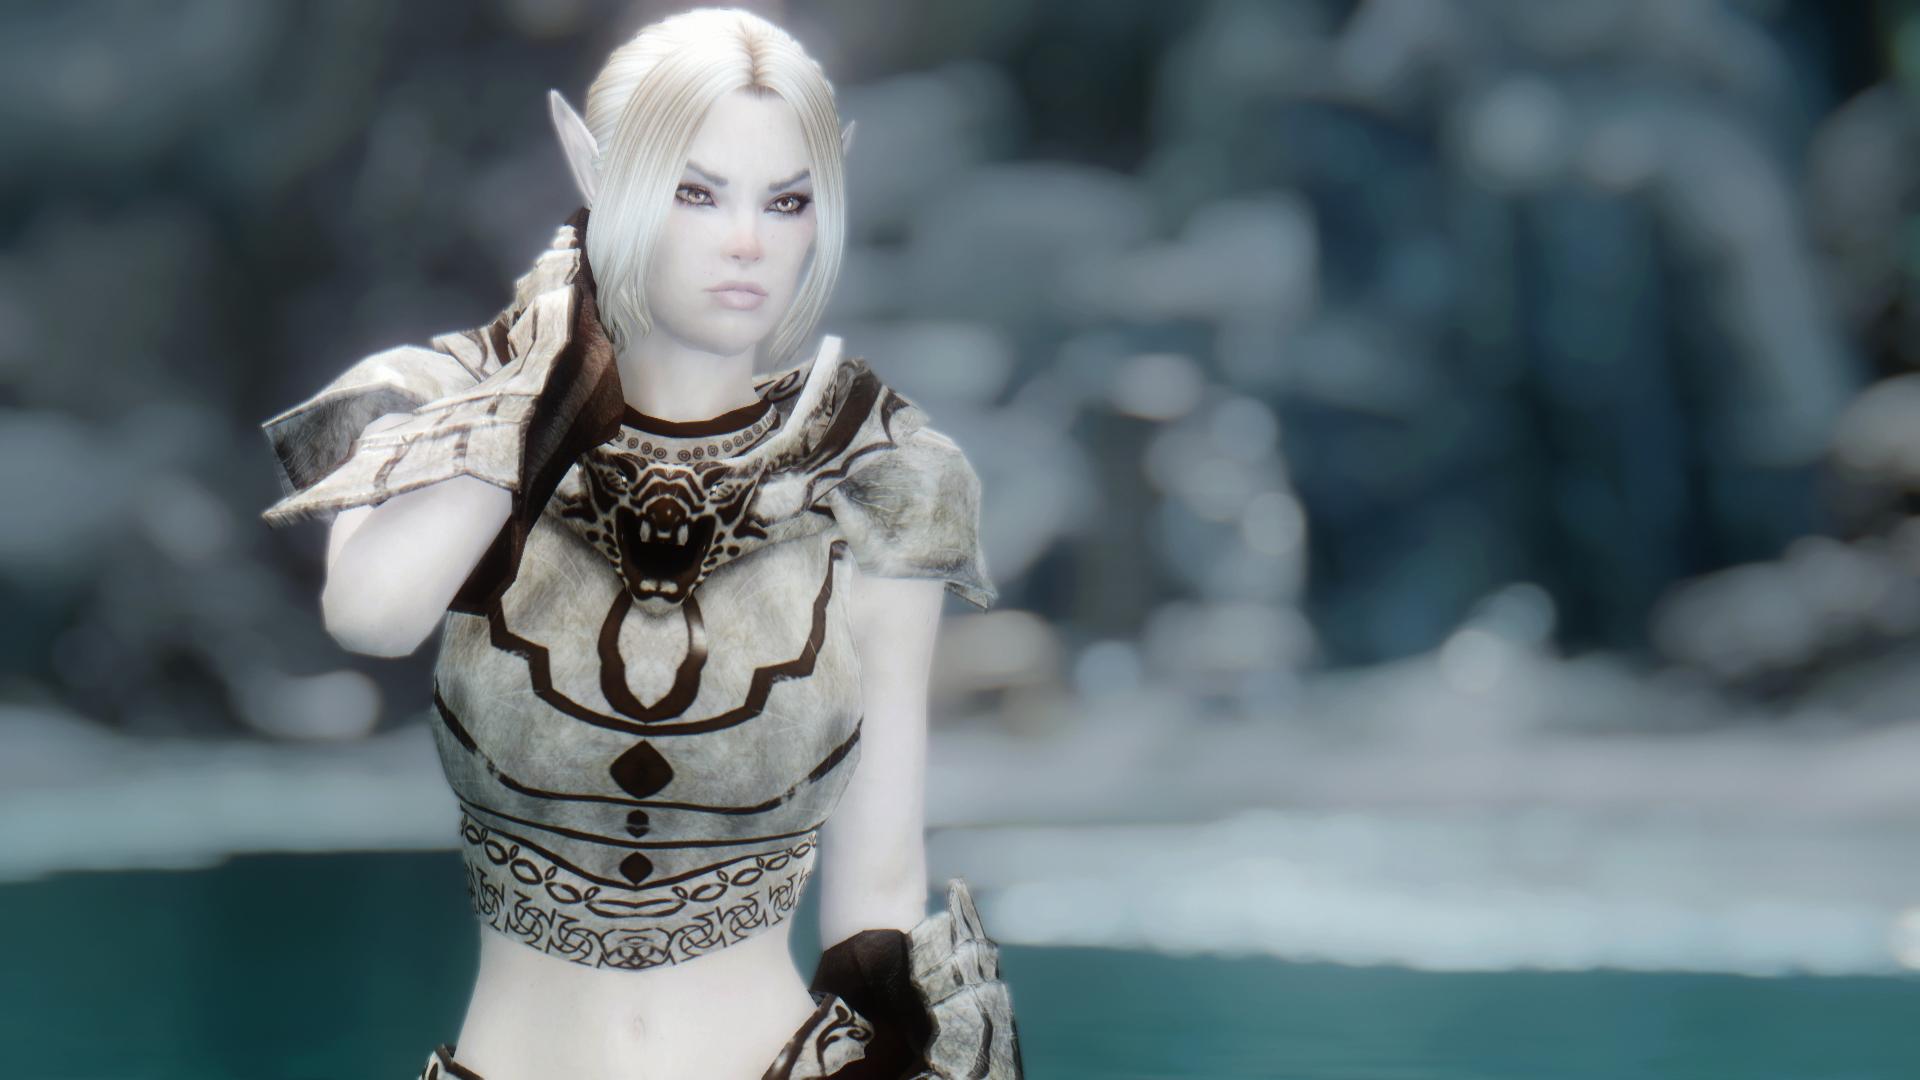 Skyrim Elf Mod Skyrim Nexus Mods Modded Snow Elf Armour